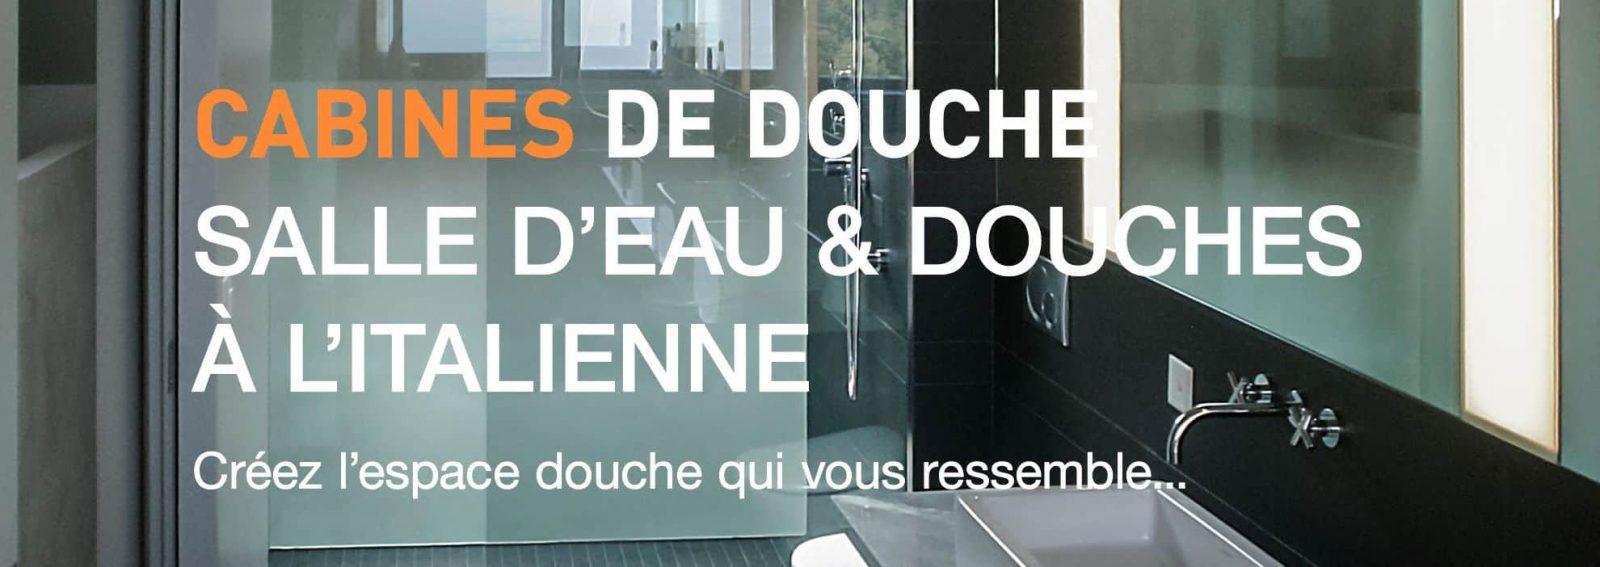 Douche2-1980x702